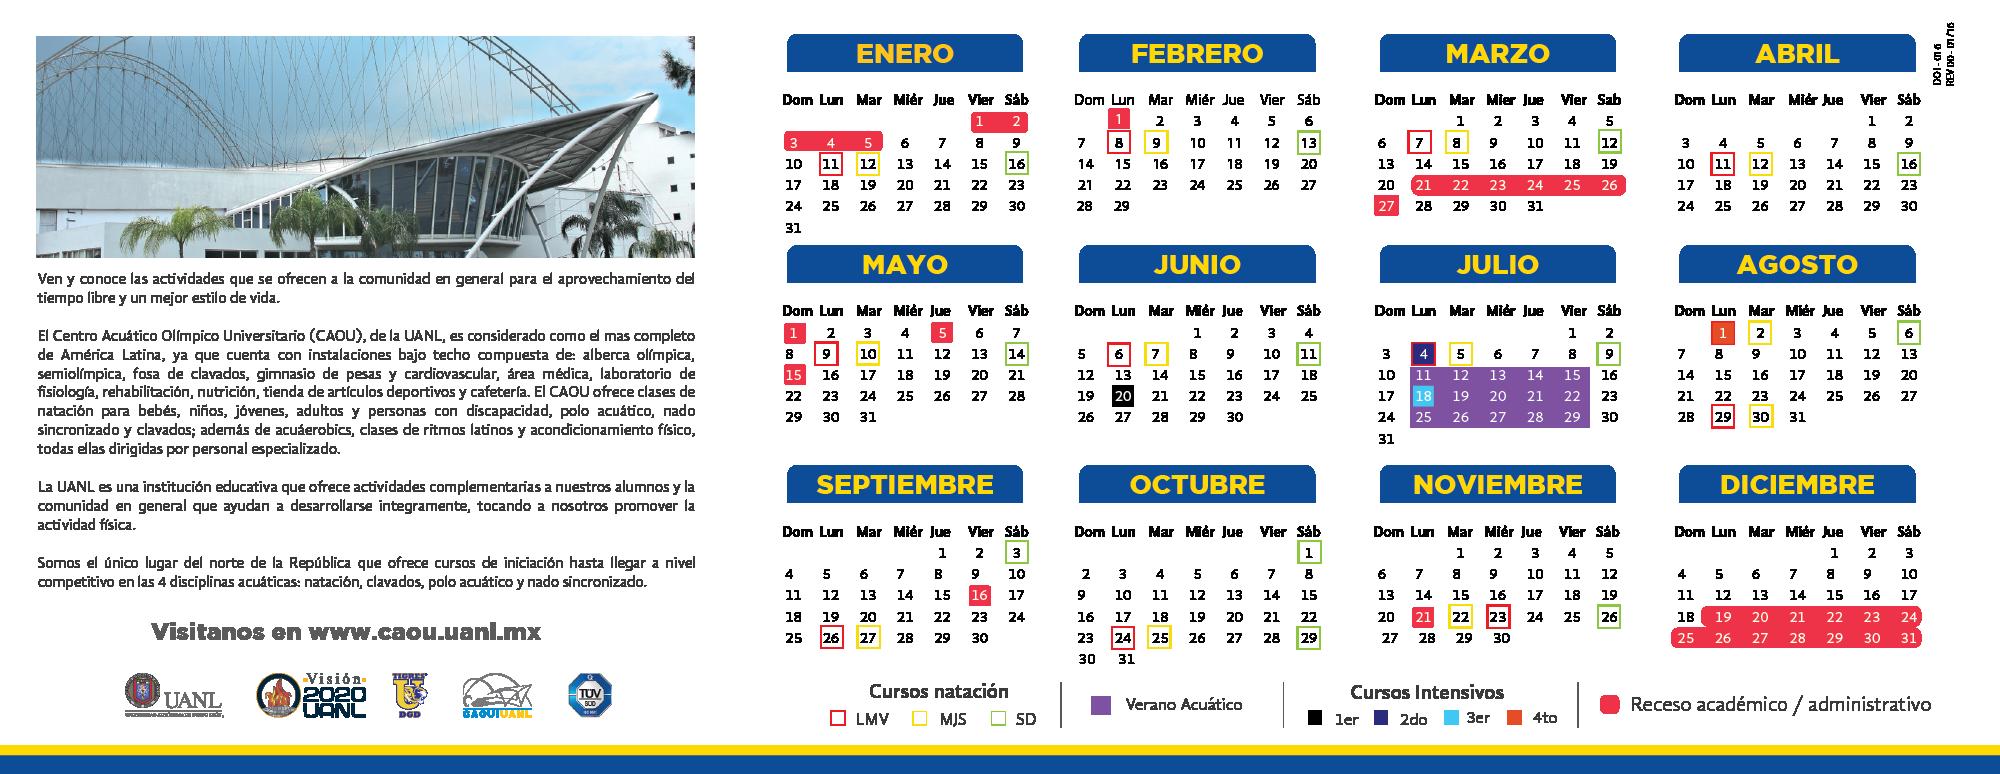 Calendario 216.Calendario Caou 216 Centro Acuatico Olimpico Universitario